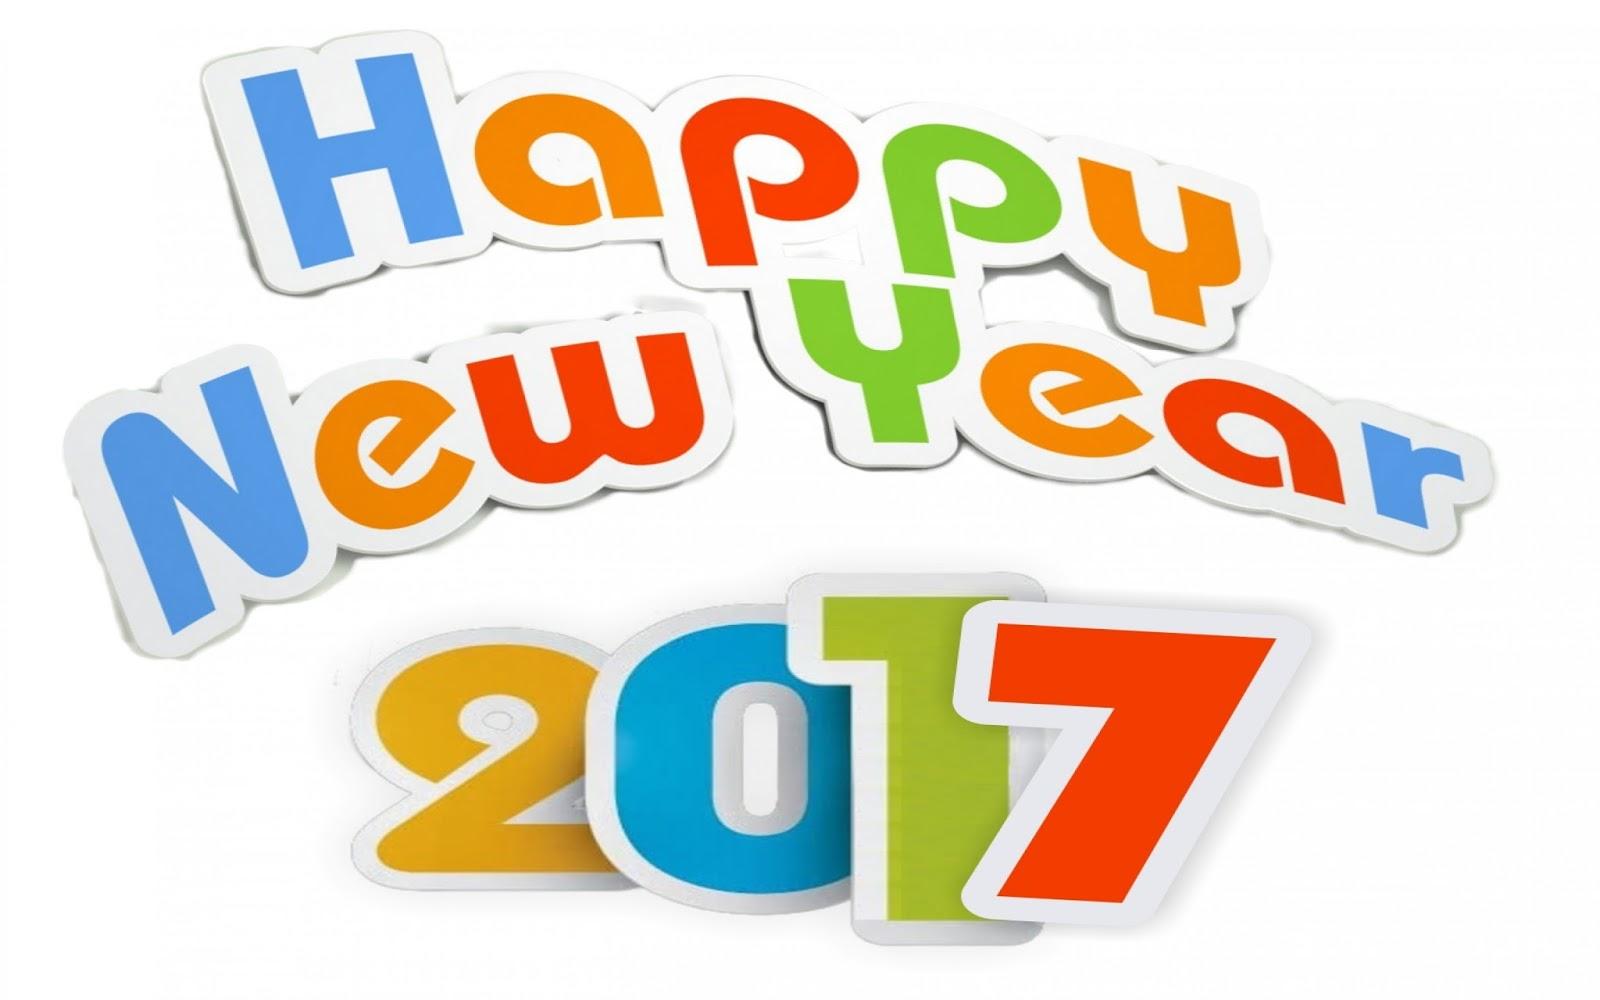 Happy new year2017